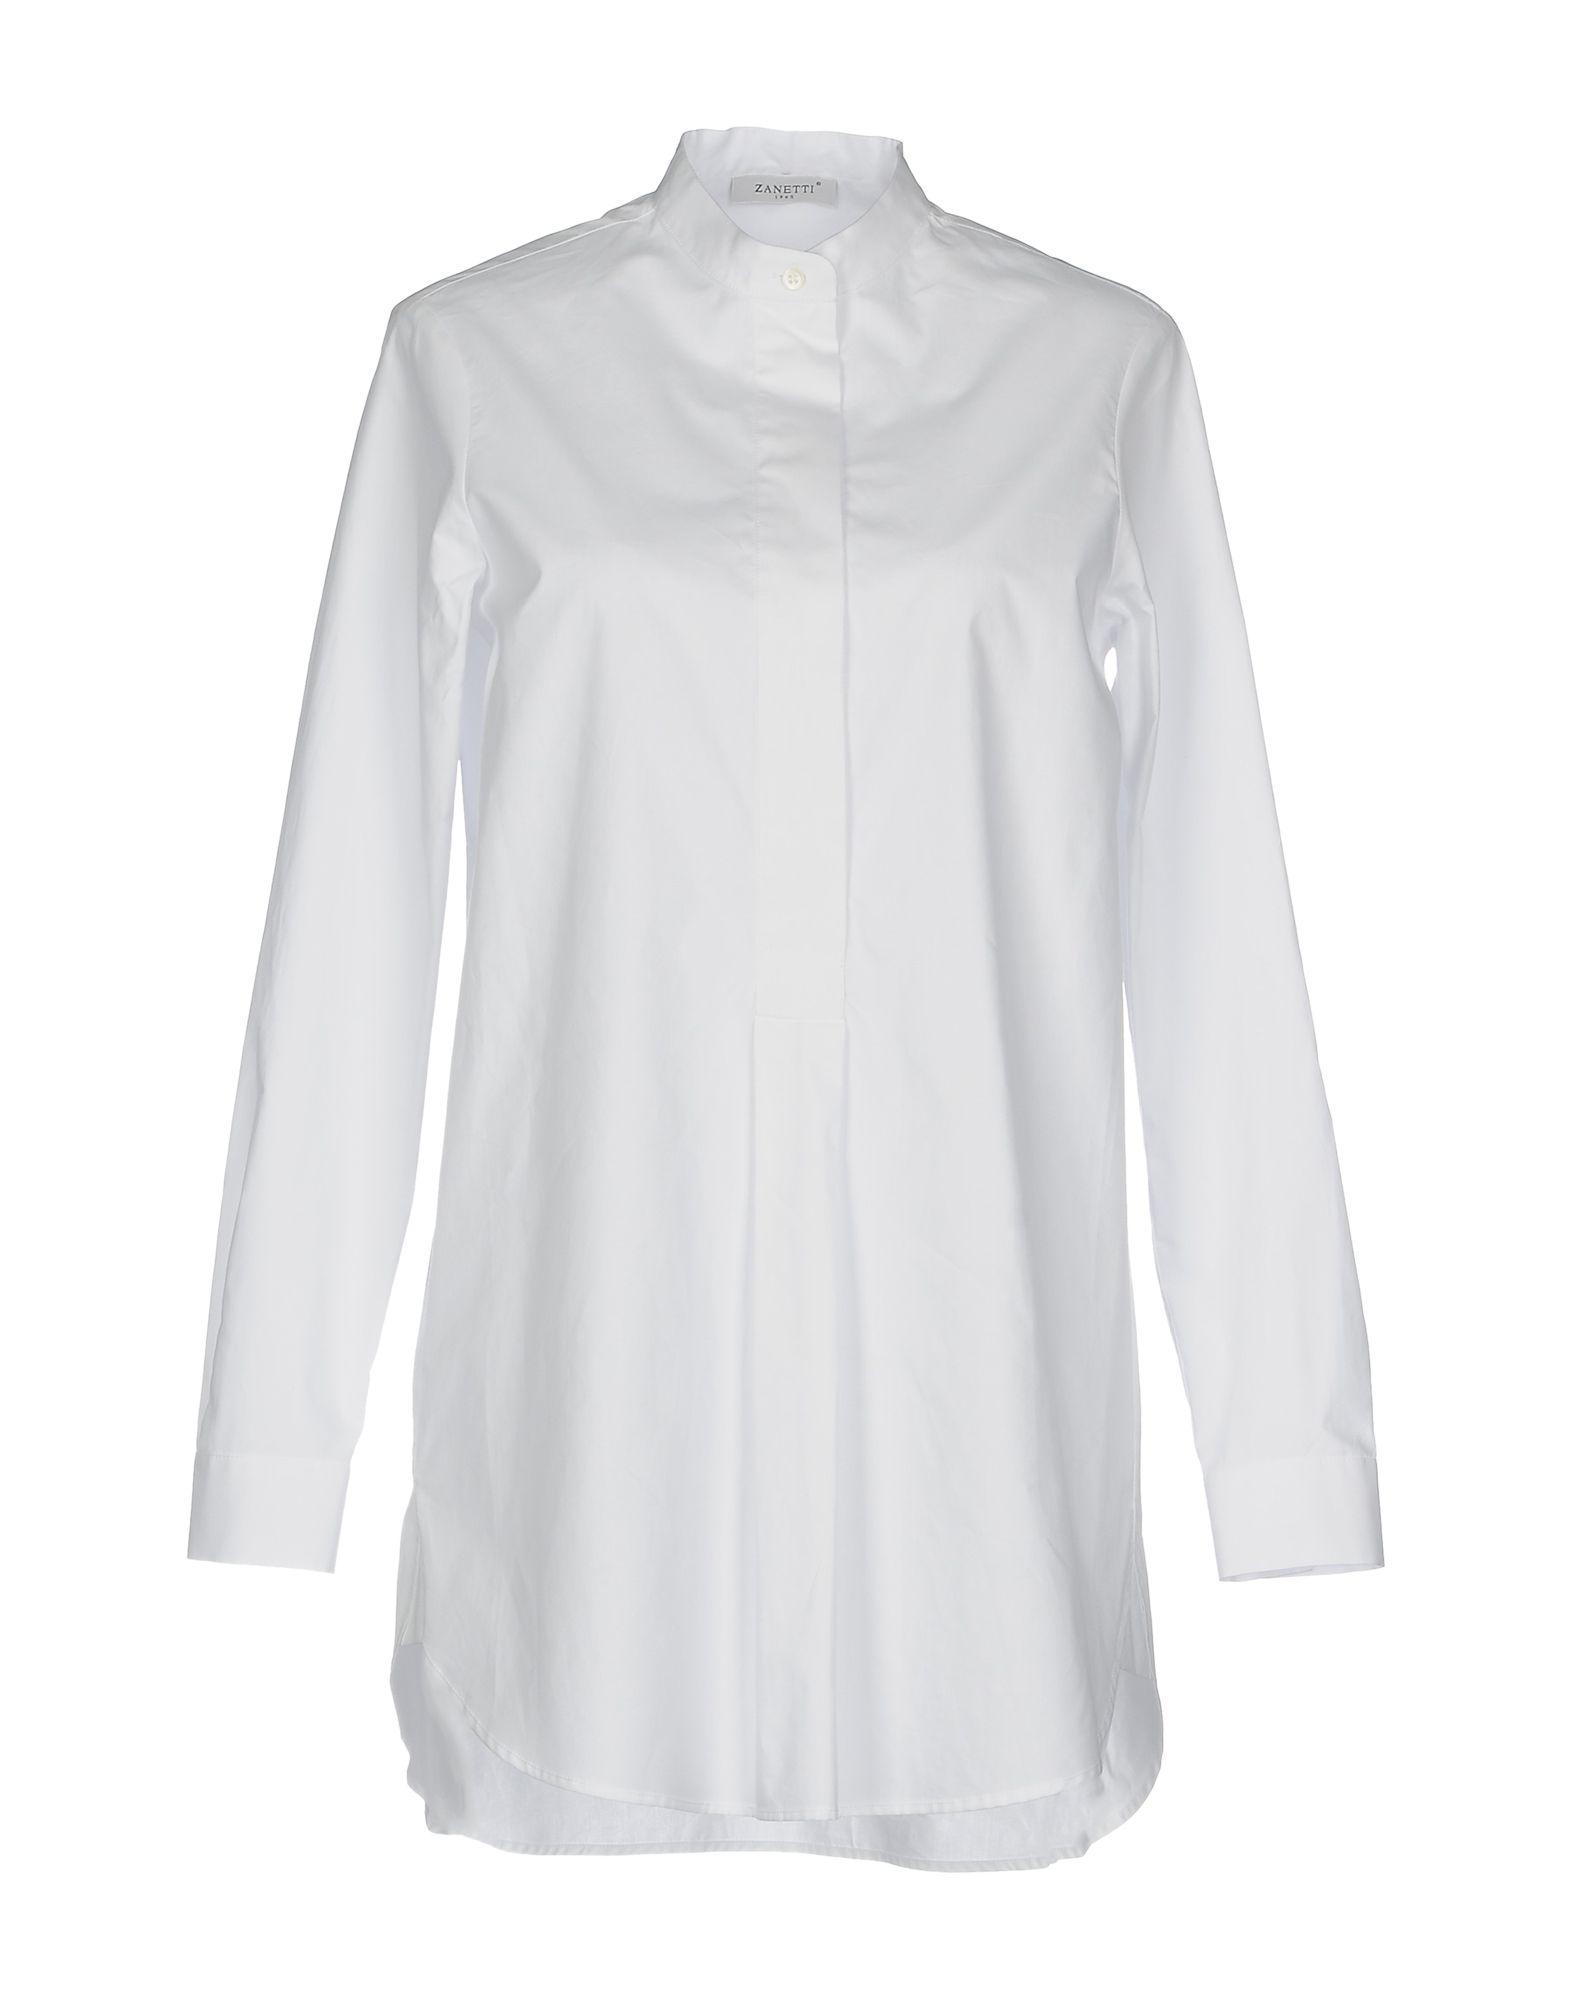 SHIRTS - Shirts Zanetti 1965 Cheapest Websites Cheap Price ammHLG